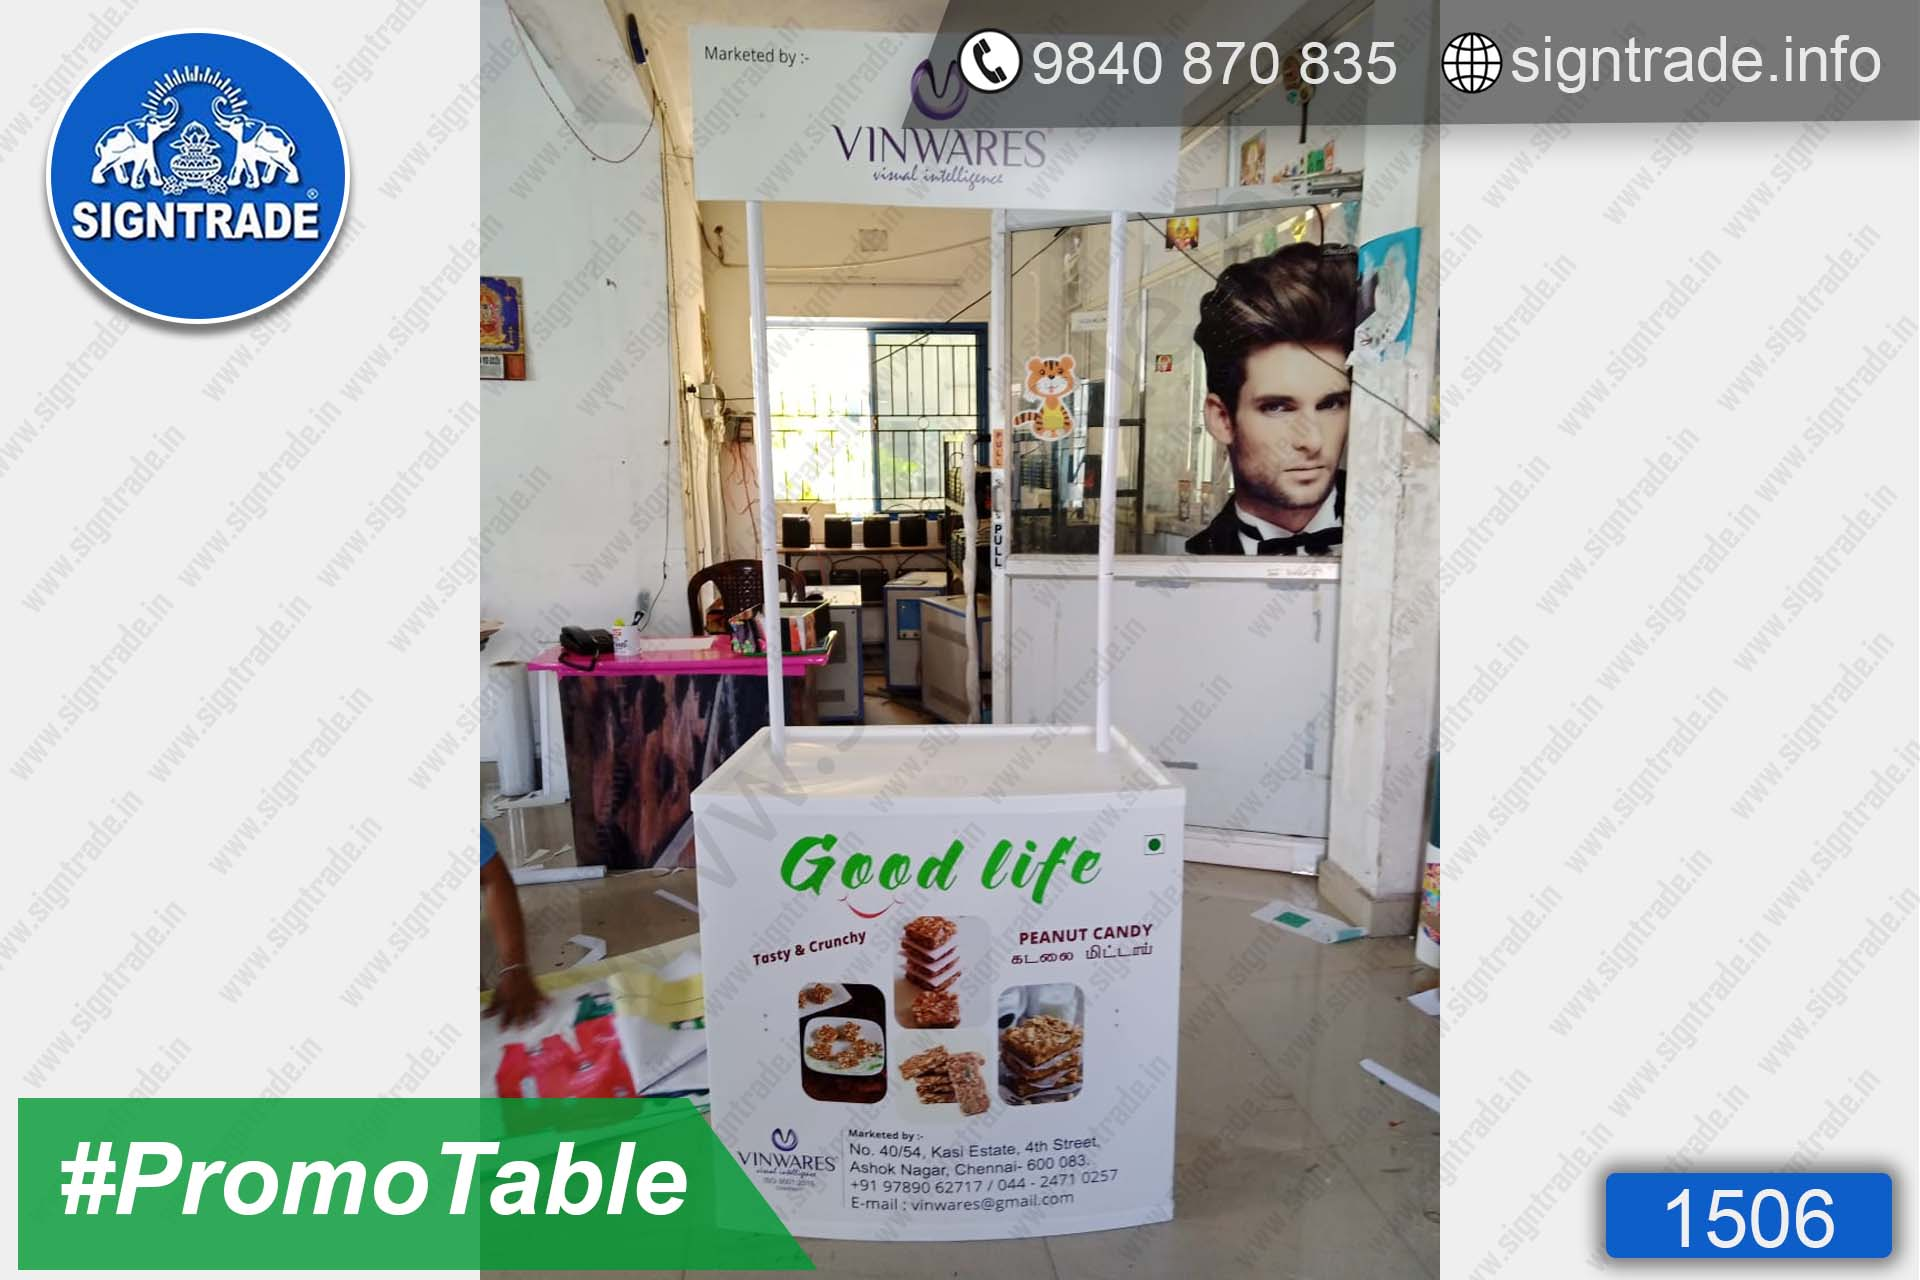 VINWARES Peanut Candy, Ashok Nagar, Chennai - SIGNTRADE - Promotional Table Manufactures in Chennai